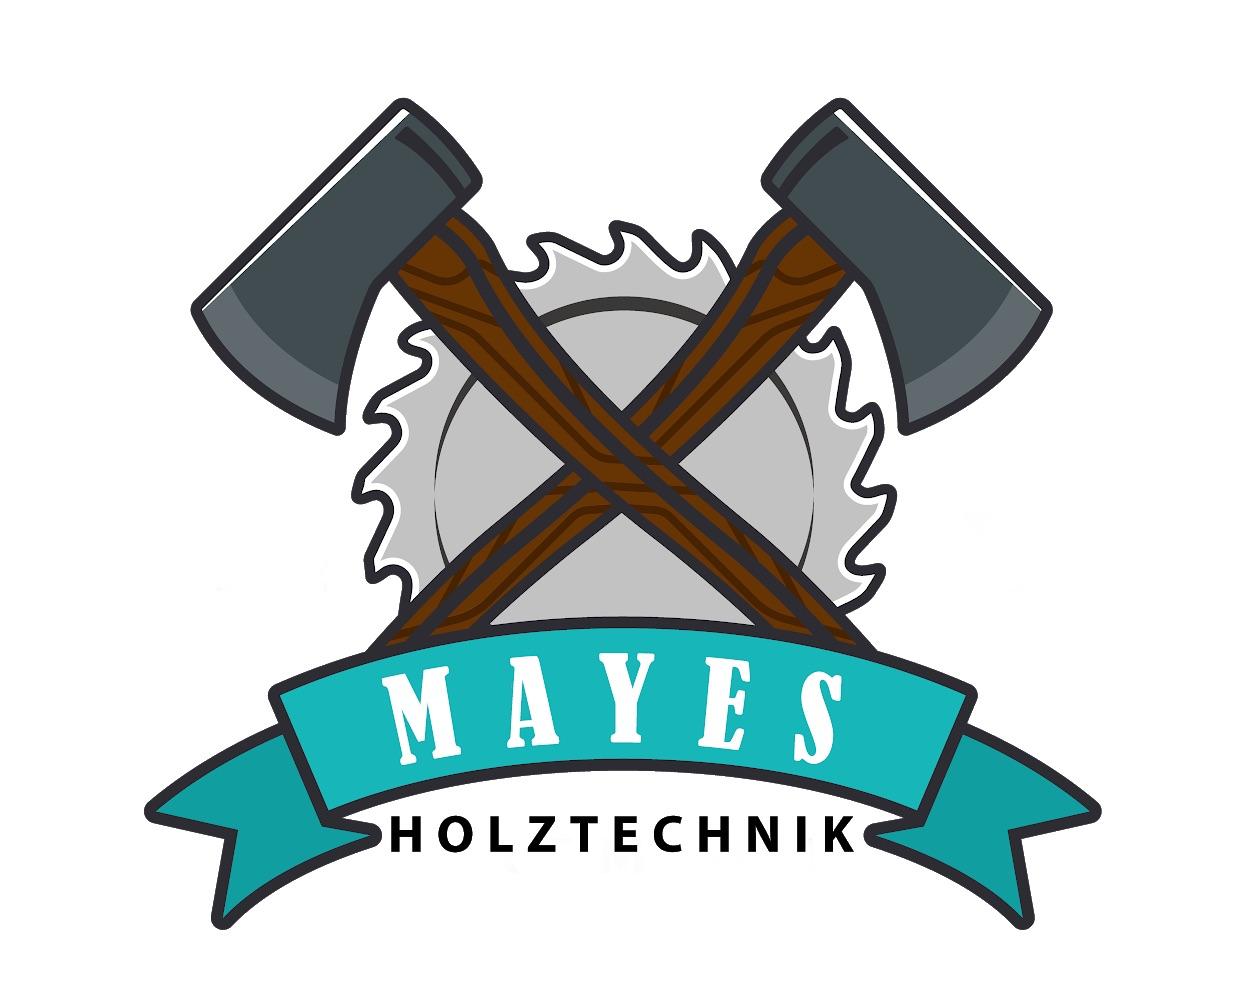 Holztechnik Mayes